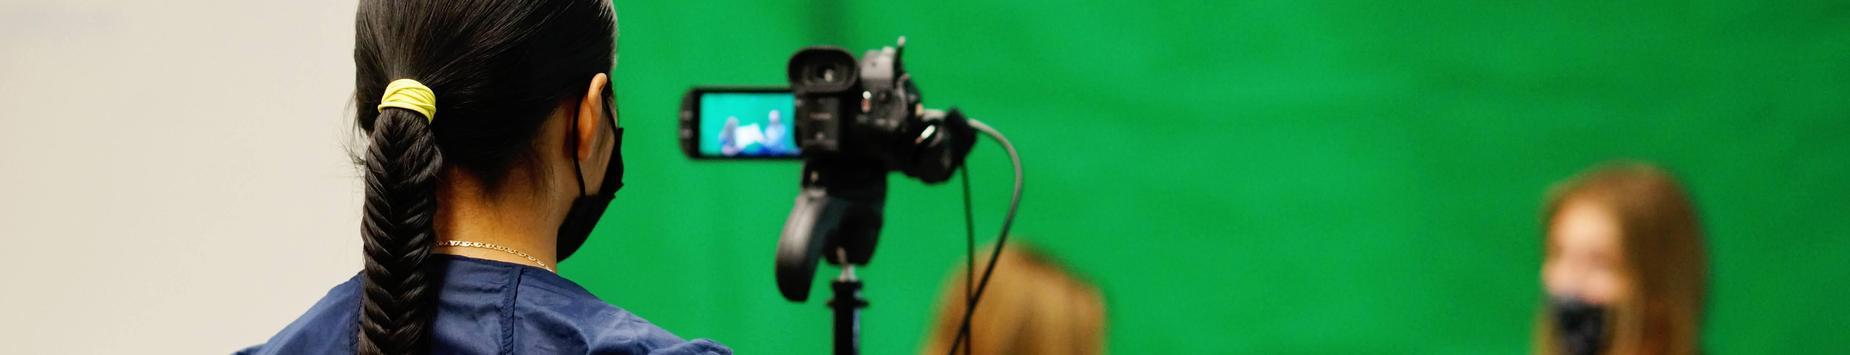 girls filming against a green screen